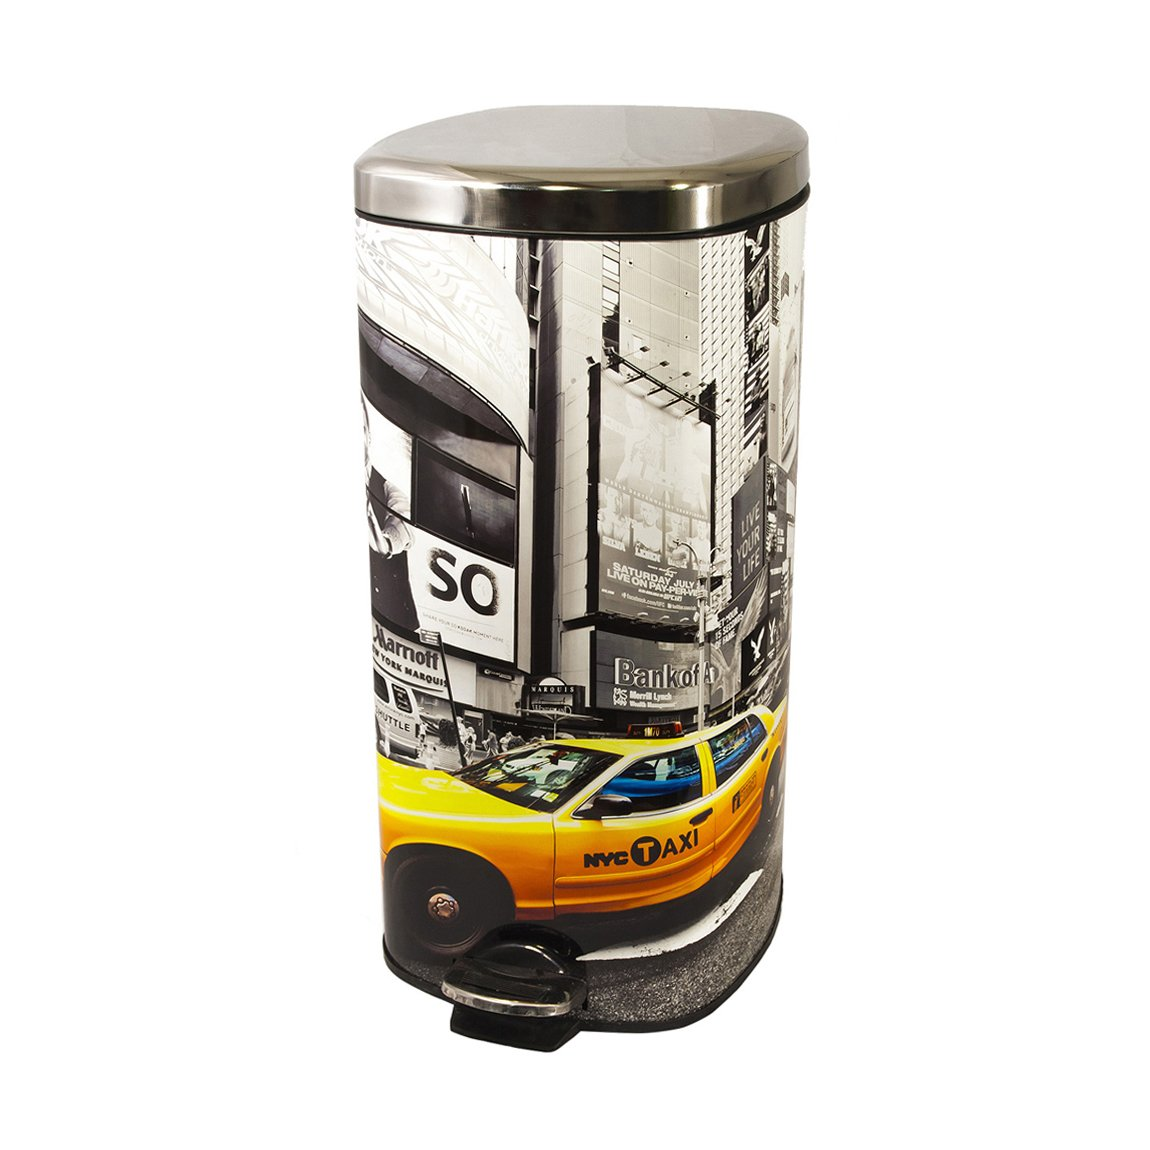 FRANDIS Cubo de Basura 30 L Metal con dise/ño York